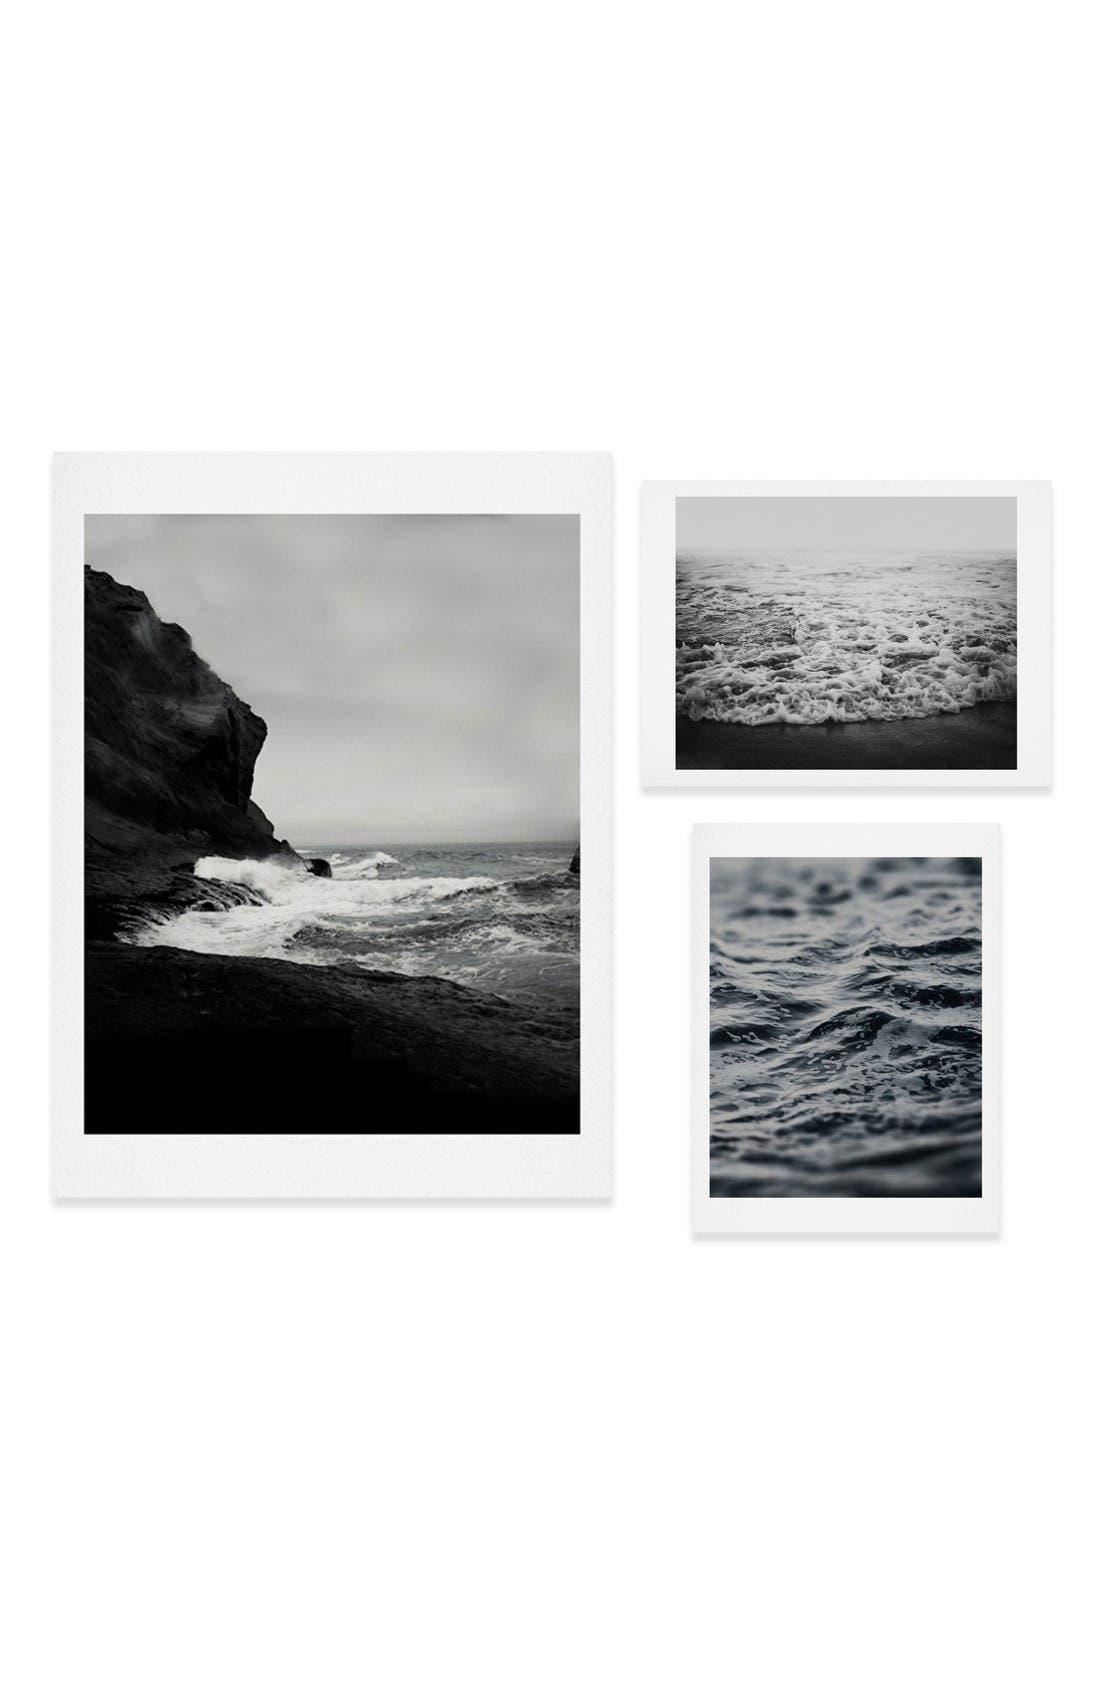 Deny Designs Waves Three-Piece Gallery Wall Art Print Set